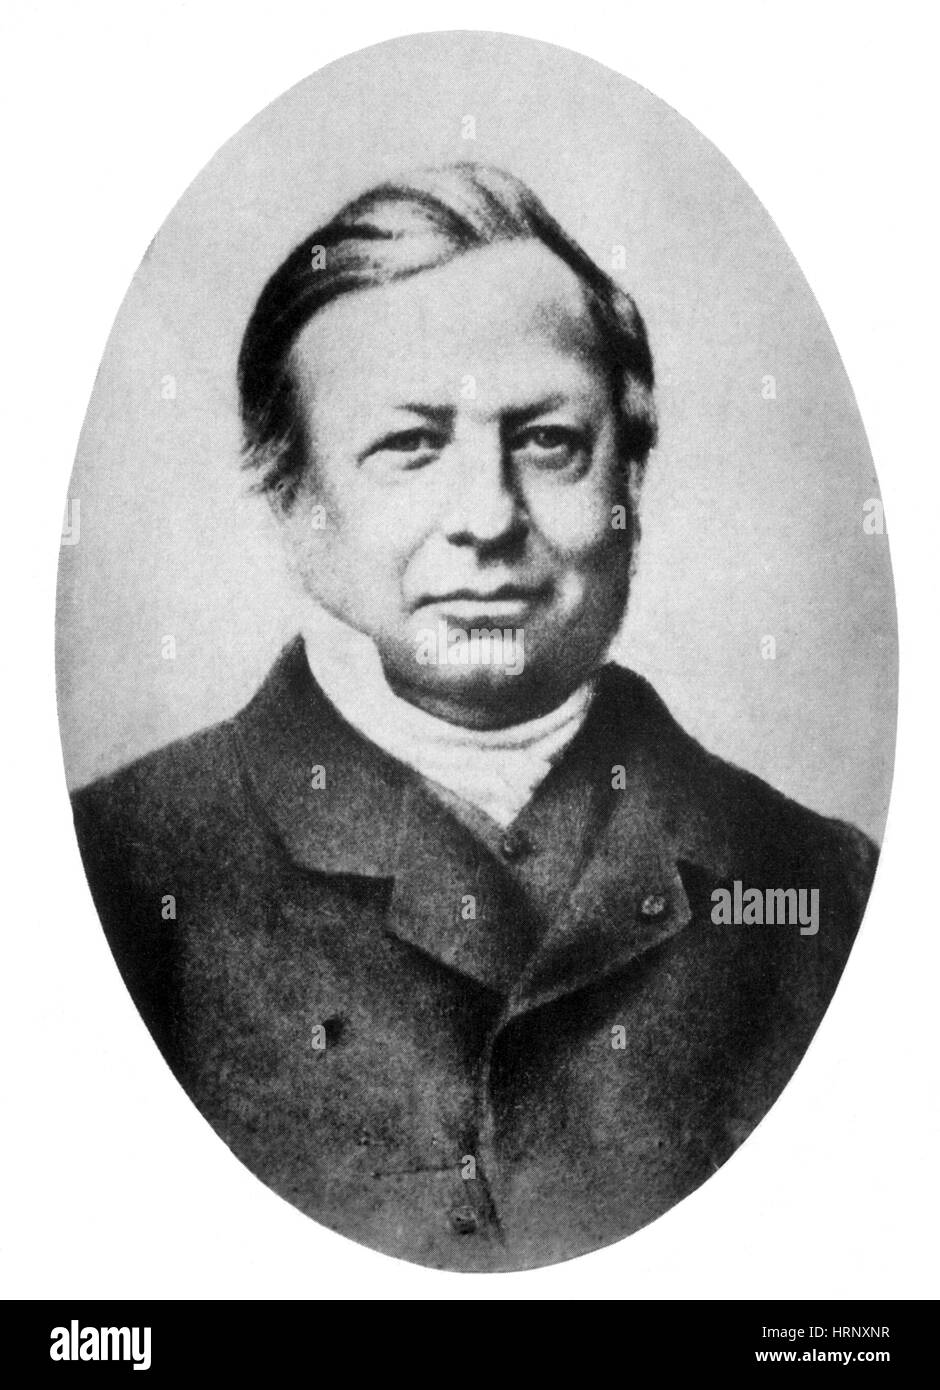 Joseph Liouville, French Mathematician - Stock Image